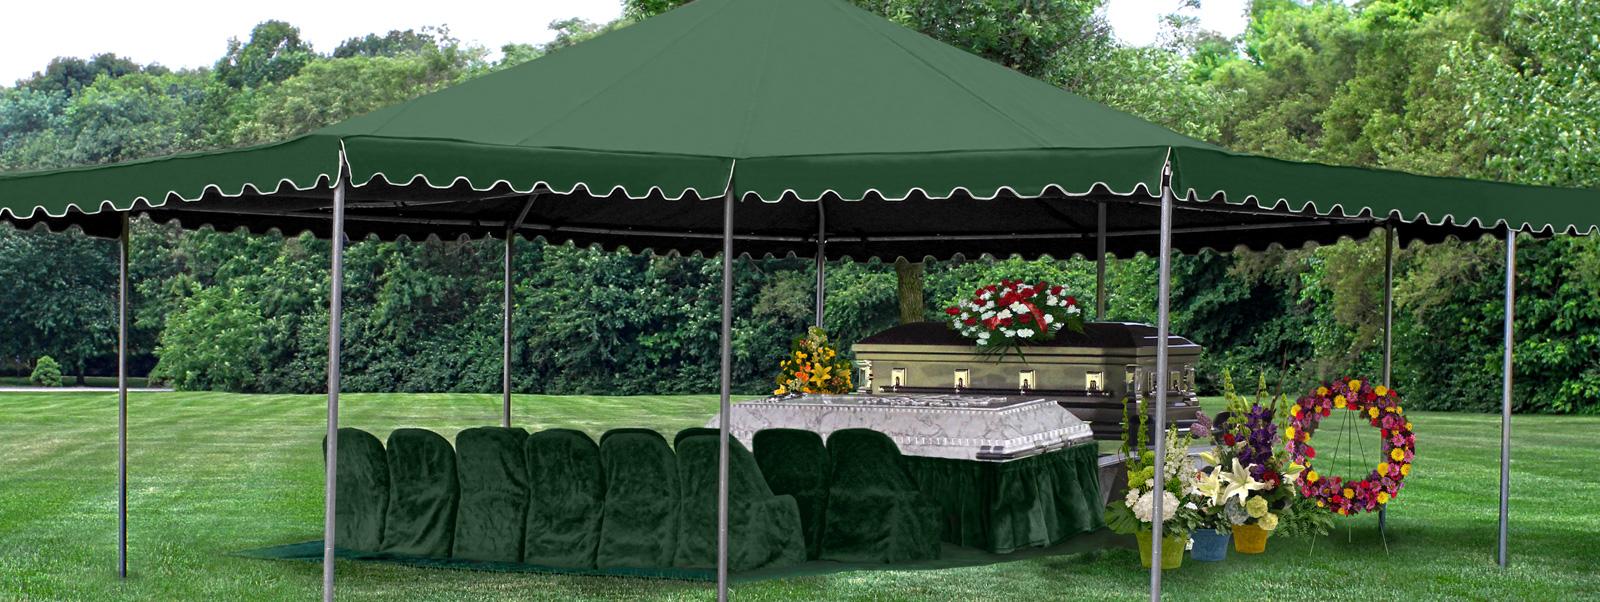 Videos - Chesapeake Burial Vault Co , Inc Chesapeake Burial Vault Co